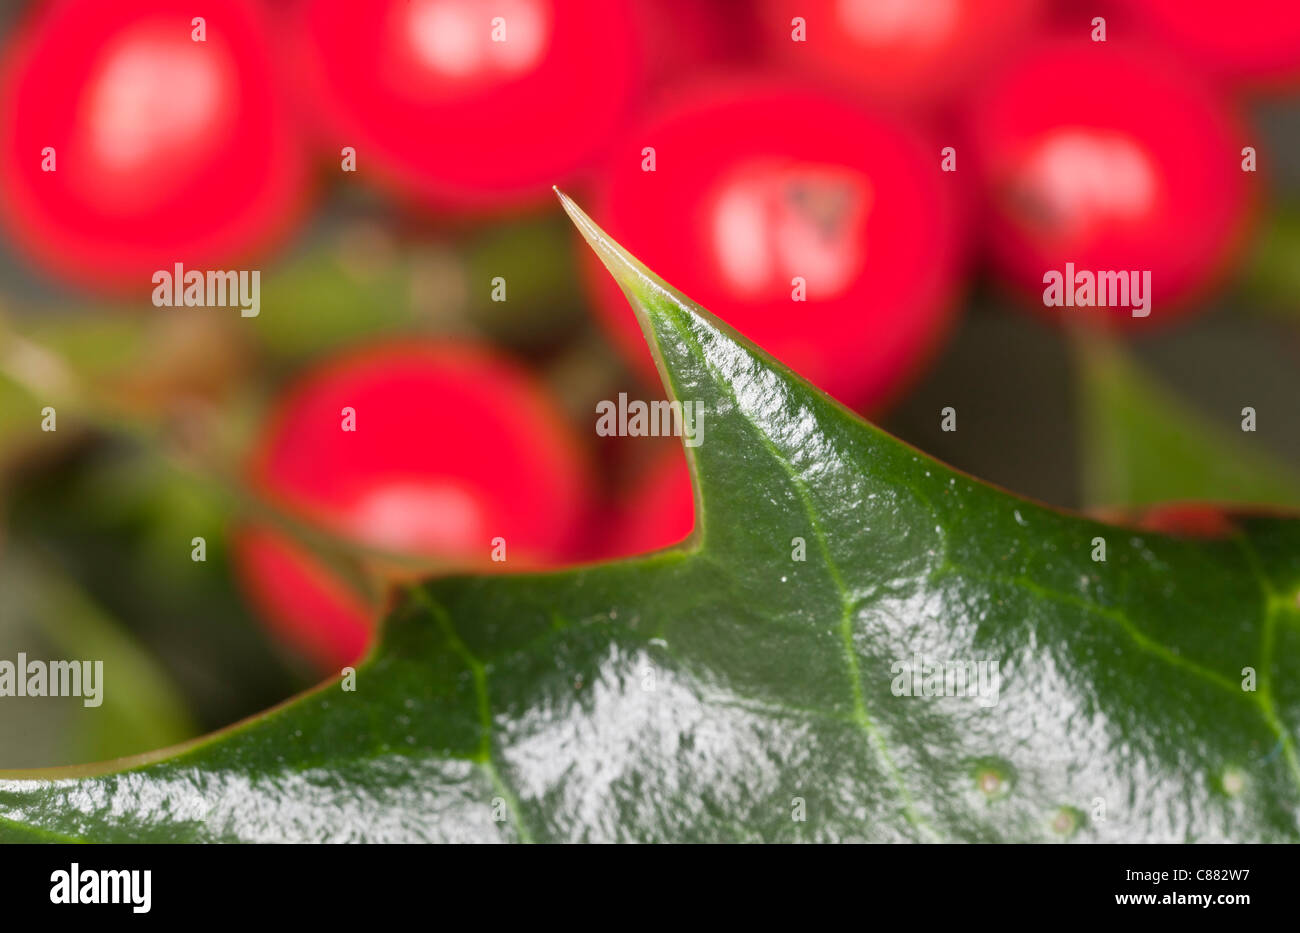 Leaf prickle of Holly, Ilex aquifolium, with berries behind. - Stock Image